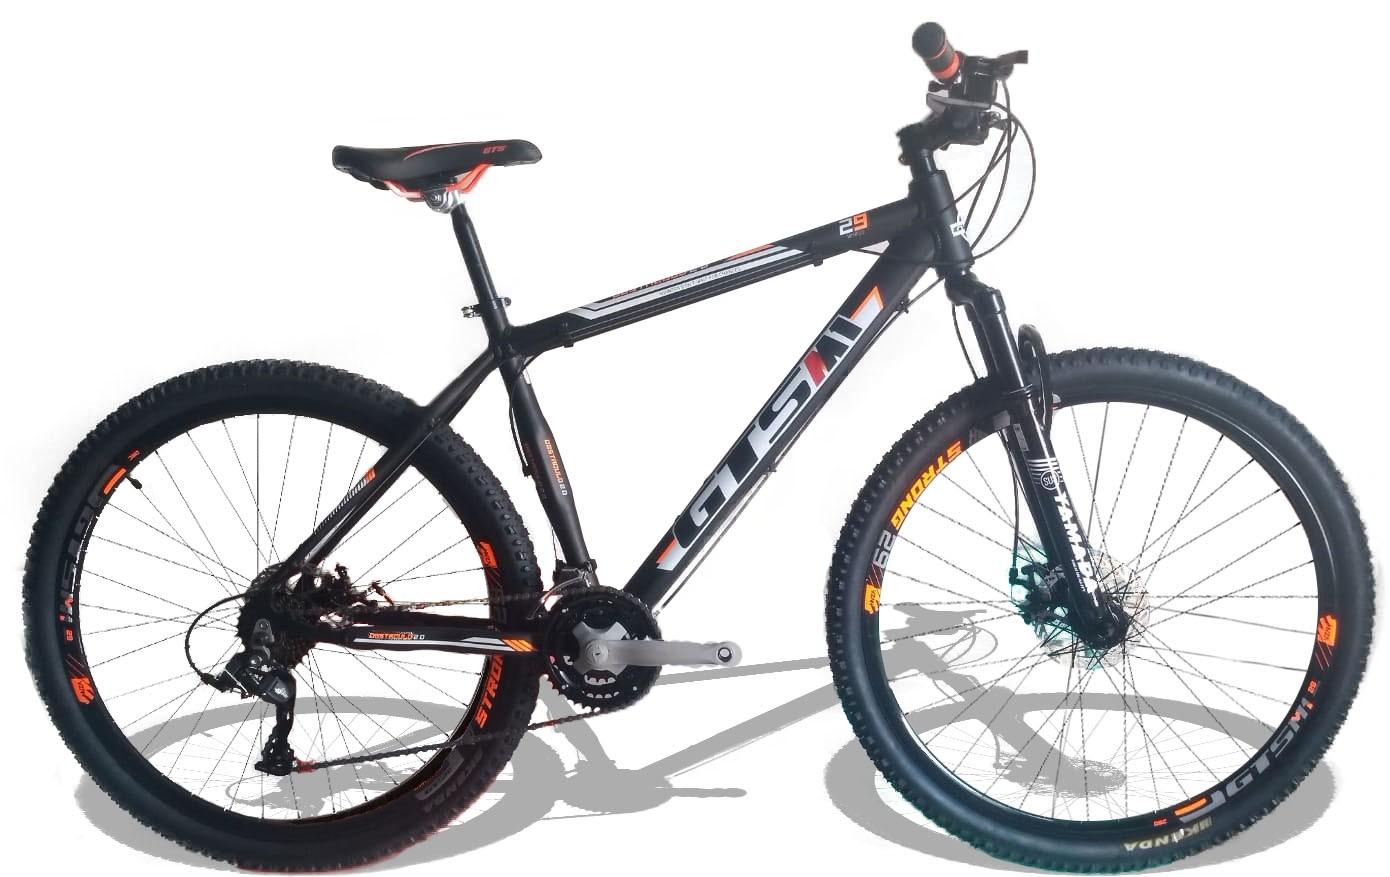 Bicicleta Gts M1 Obstáculo 2.0 Preta Laranja Aro 29   - REAL ESPORTE